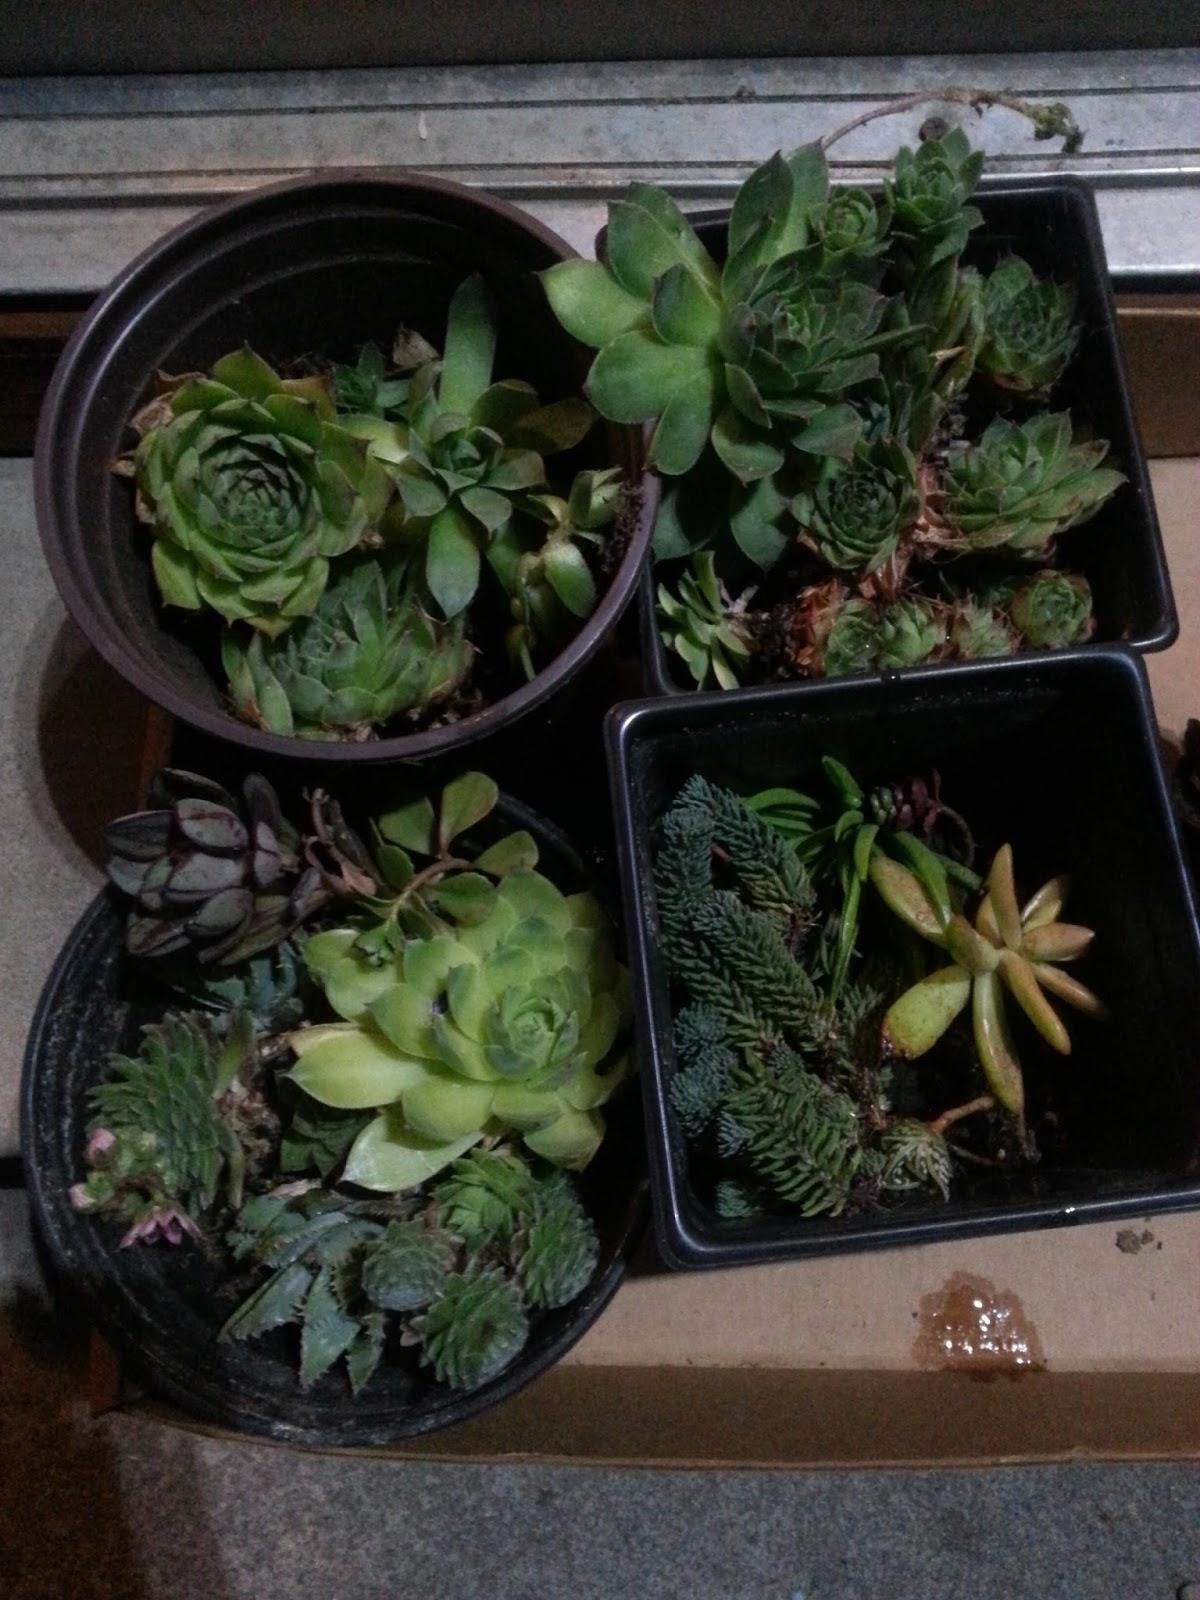 echeveria rosea, aloe, sempervivum, sedum, succulents, oregon